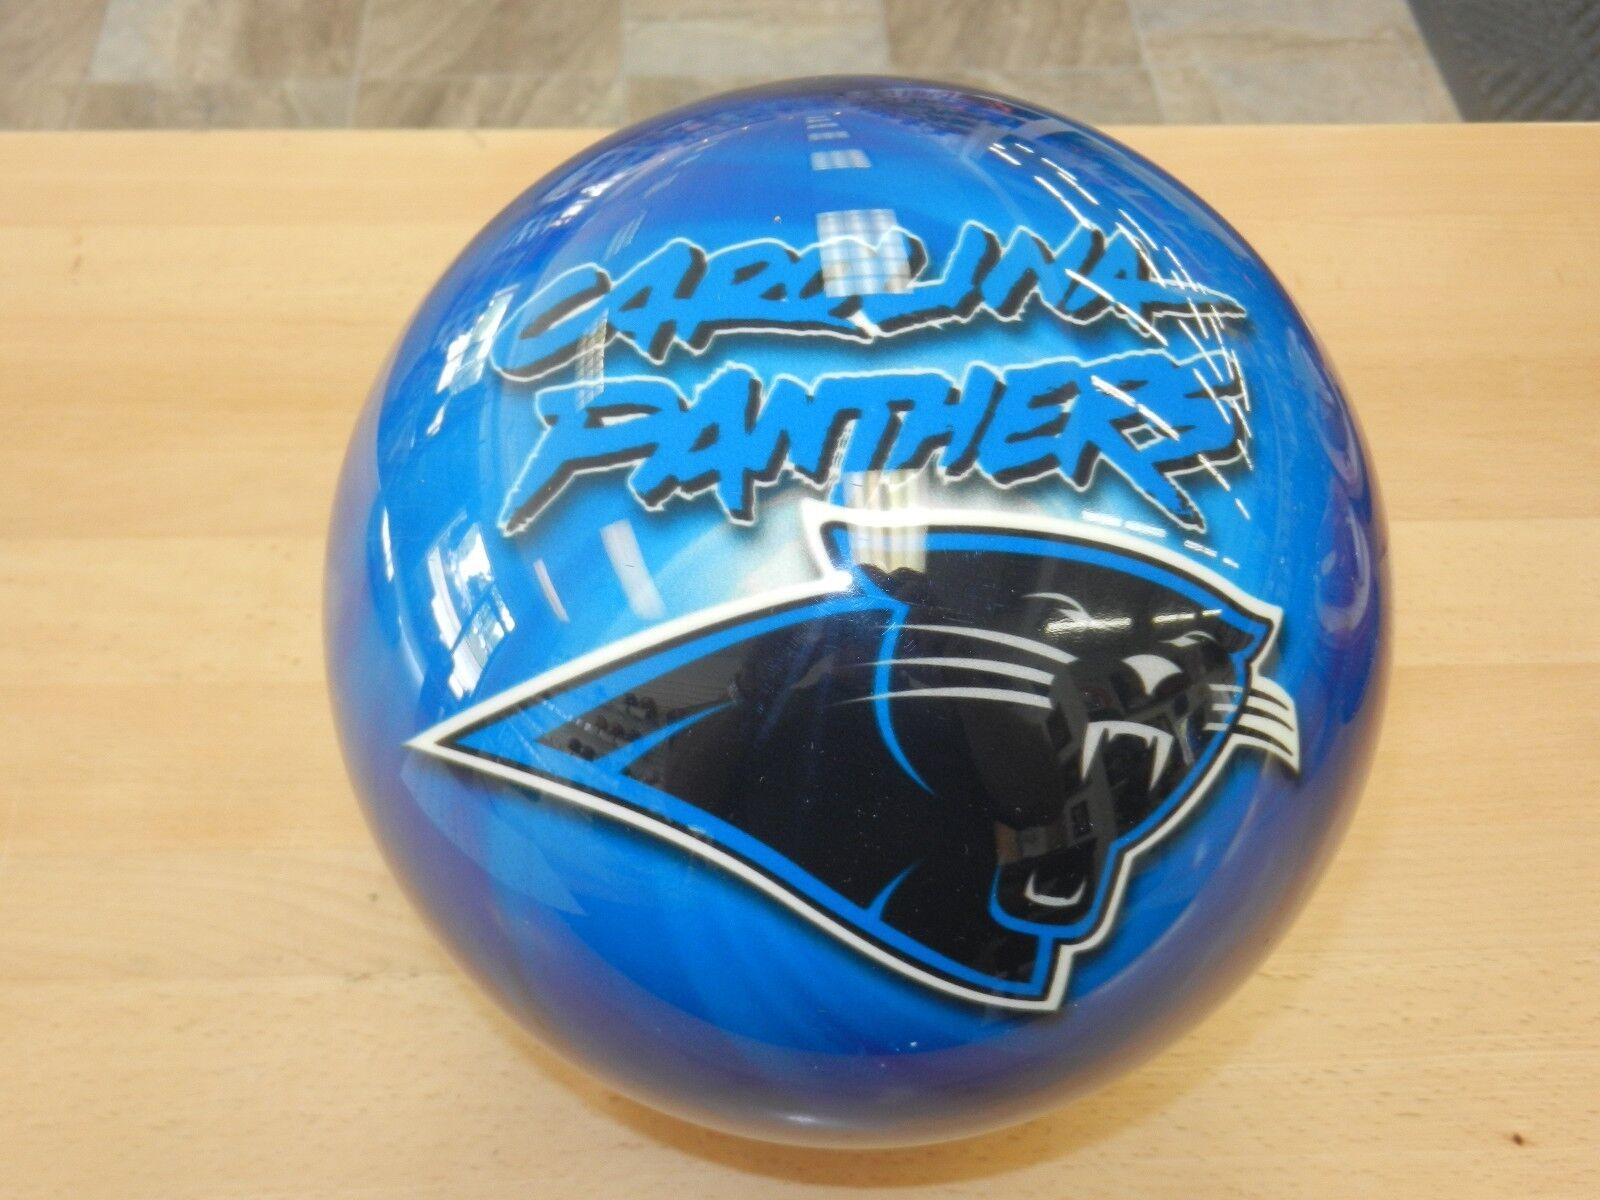 New in Original Box Undrilled 15OTB NFL Carolina Panthers Bowling Ball